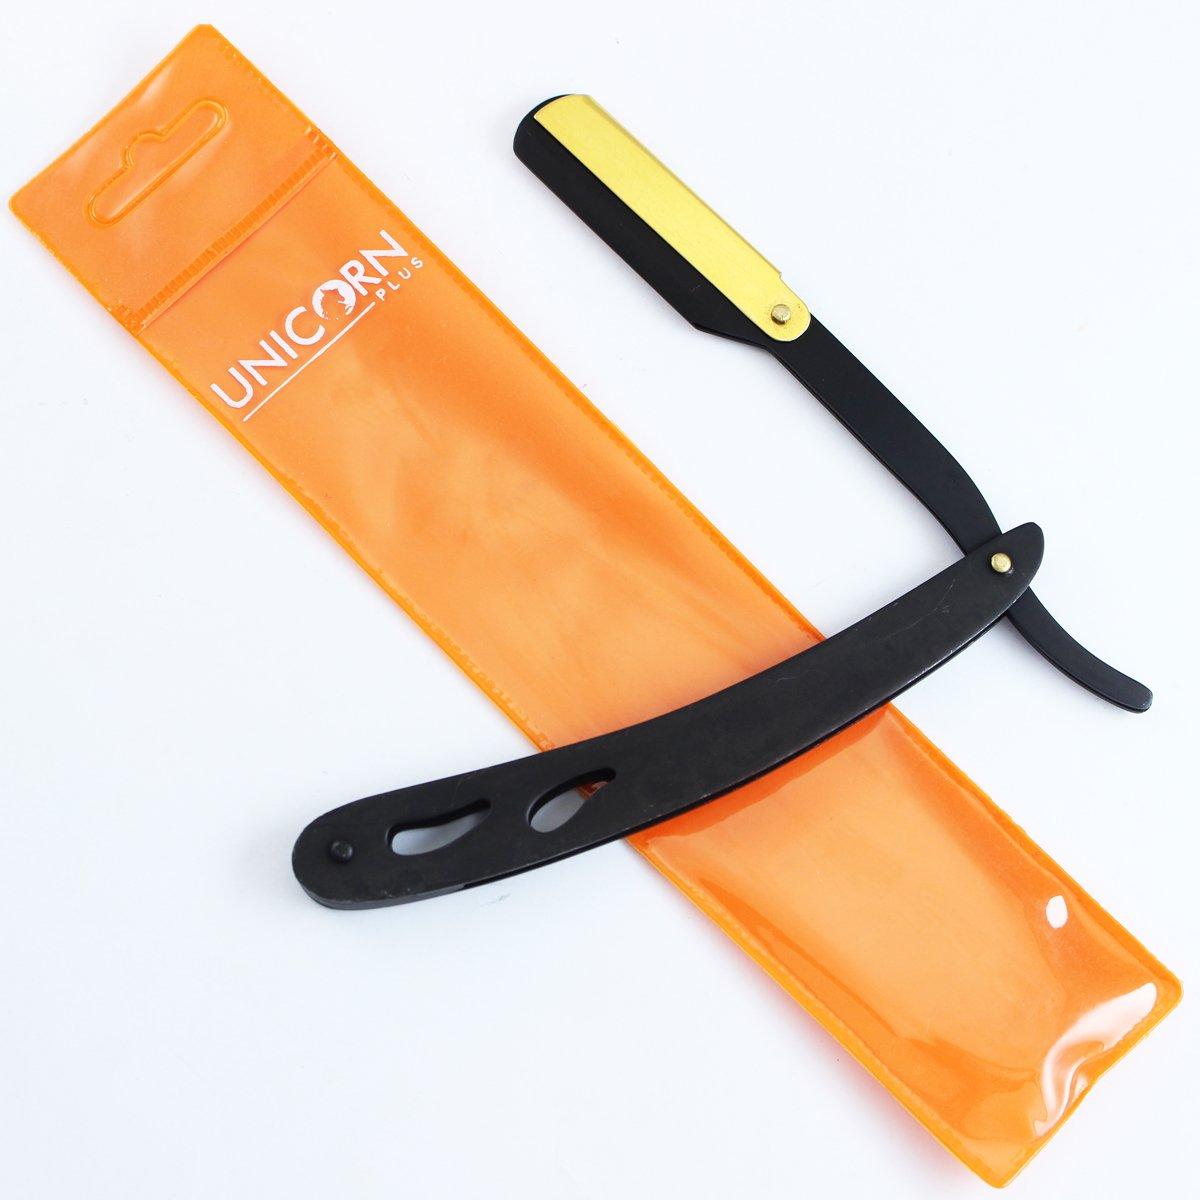 Brand New - Professional Cut Throat Stainless Steel Shaver Deep Black & Orange Straight Edge St Barber Razor Folding Shaving Hair Removal Tools + PVC Unicorn Plus RZ-84C-B